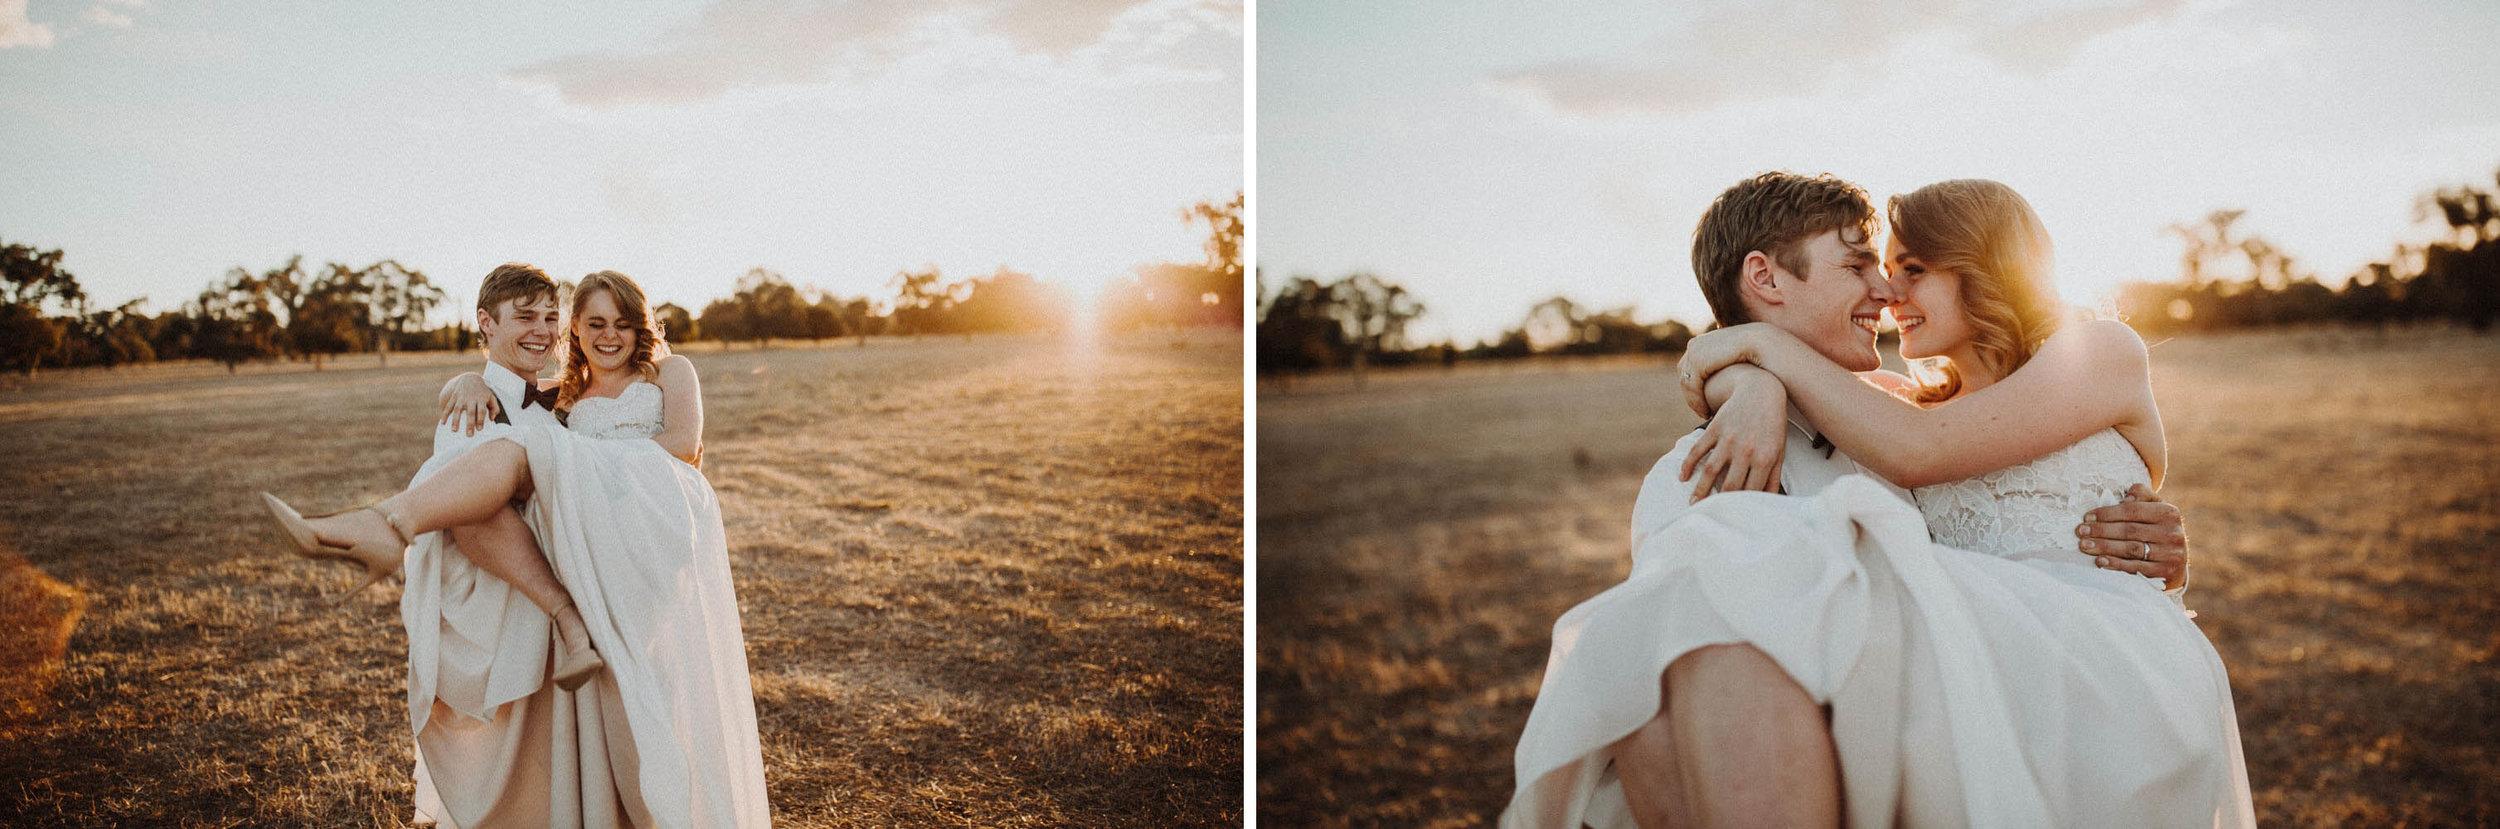 australian-wedding-photography_177(3384)2.jpg